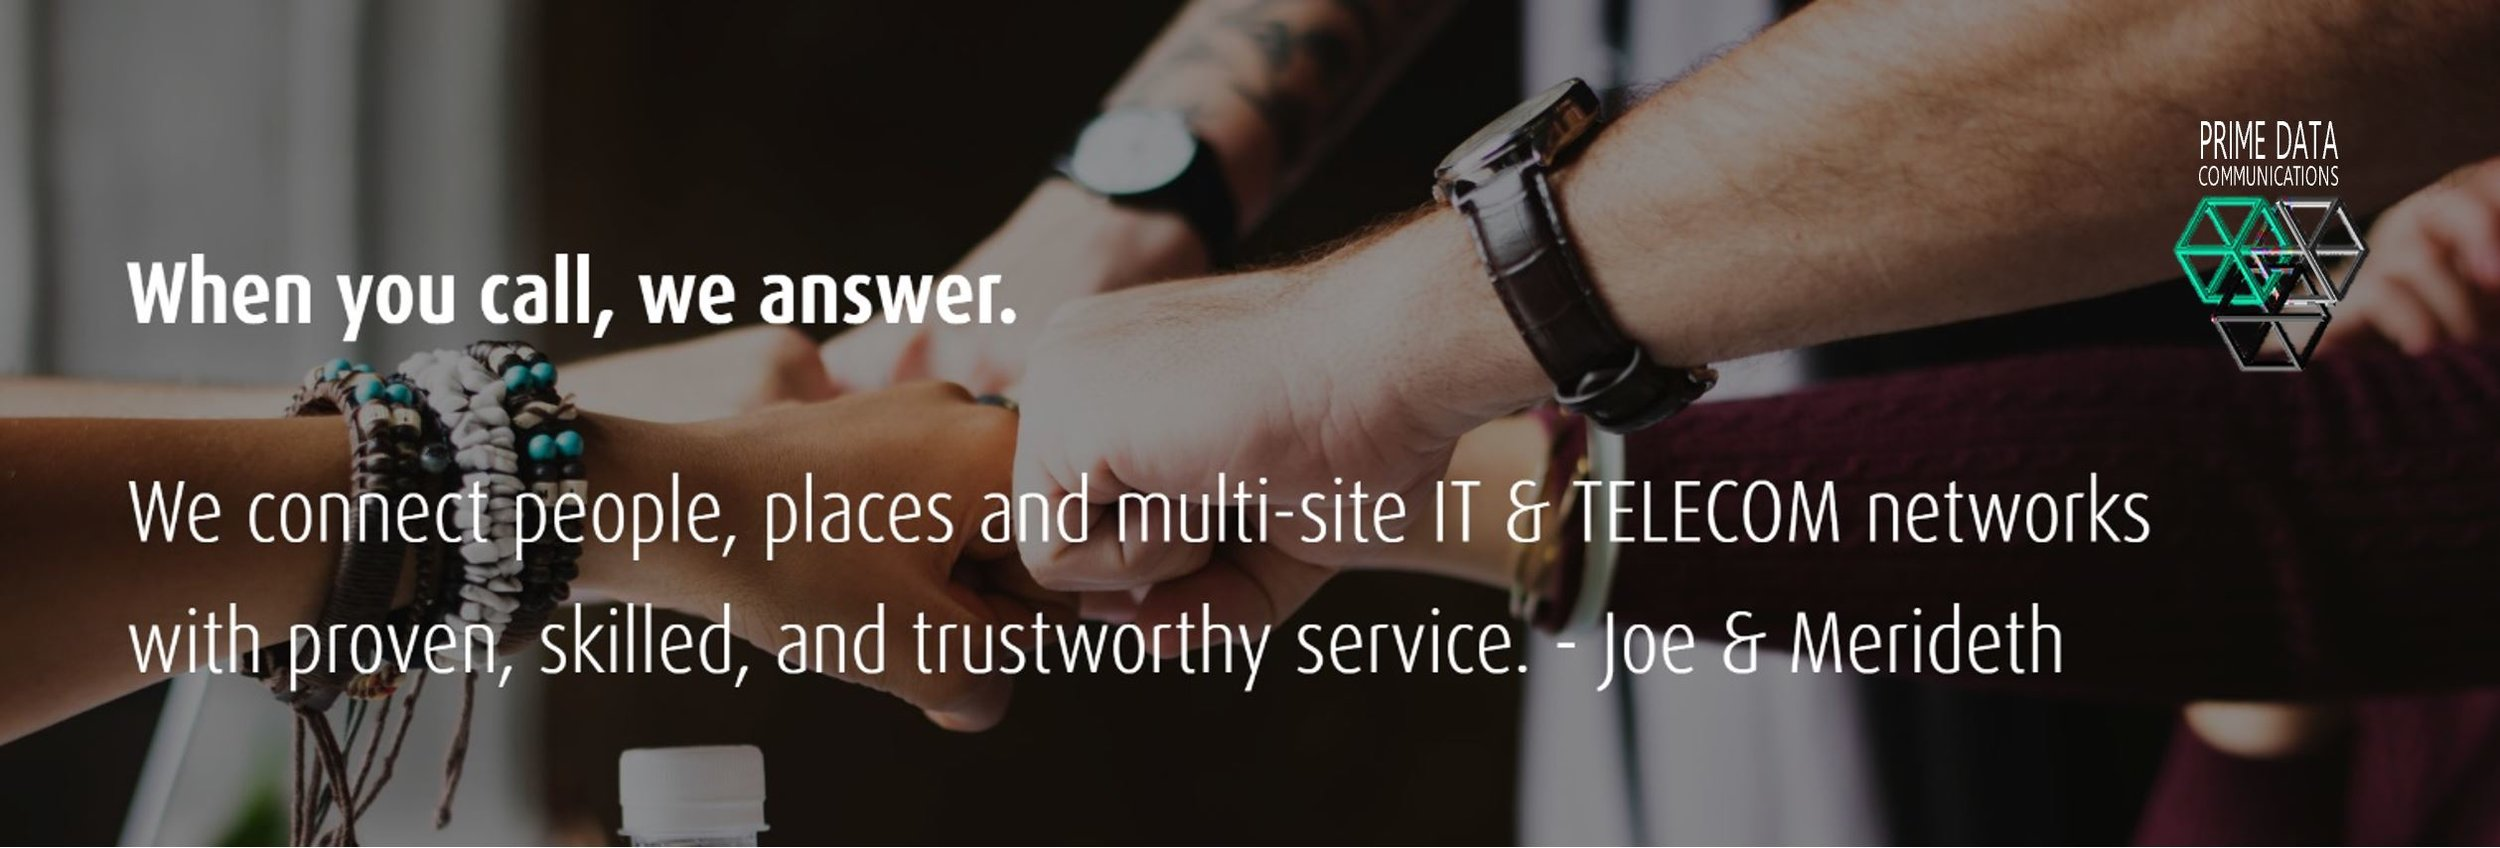 Ad - Great Service.JPG